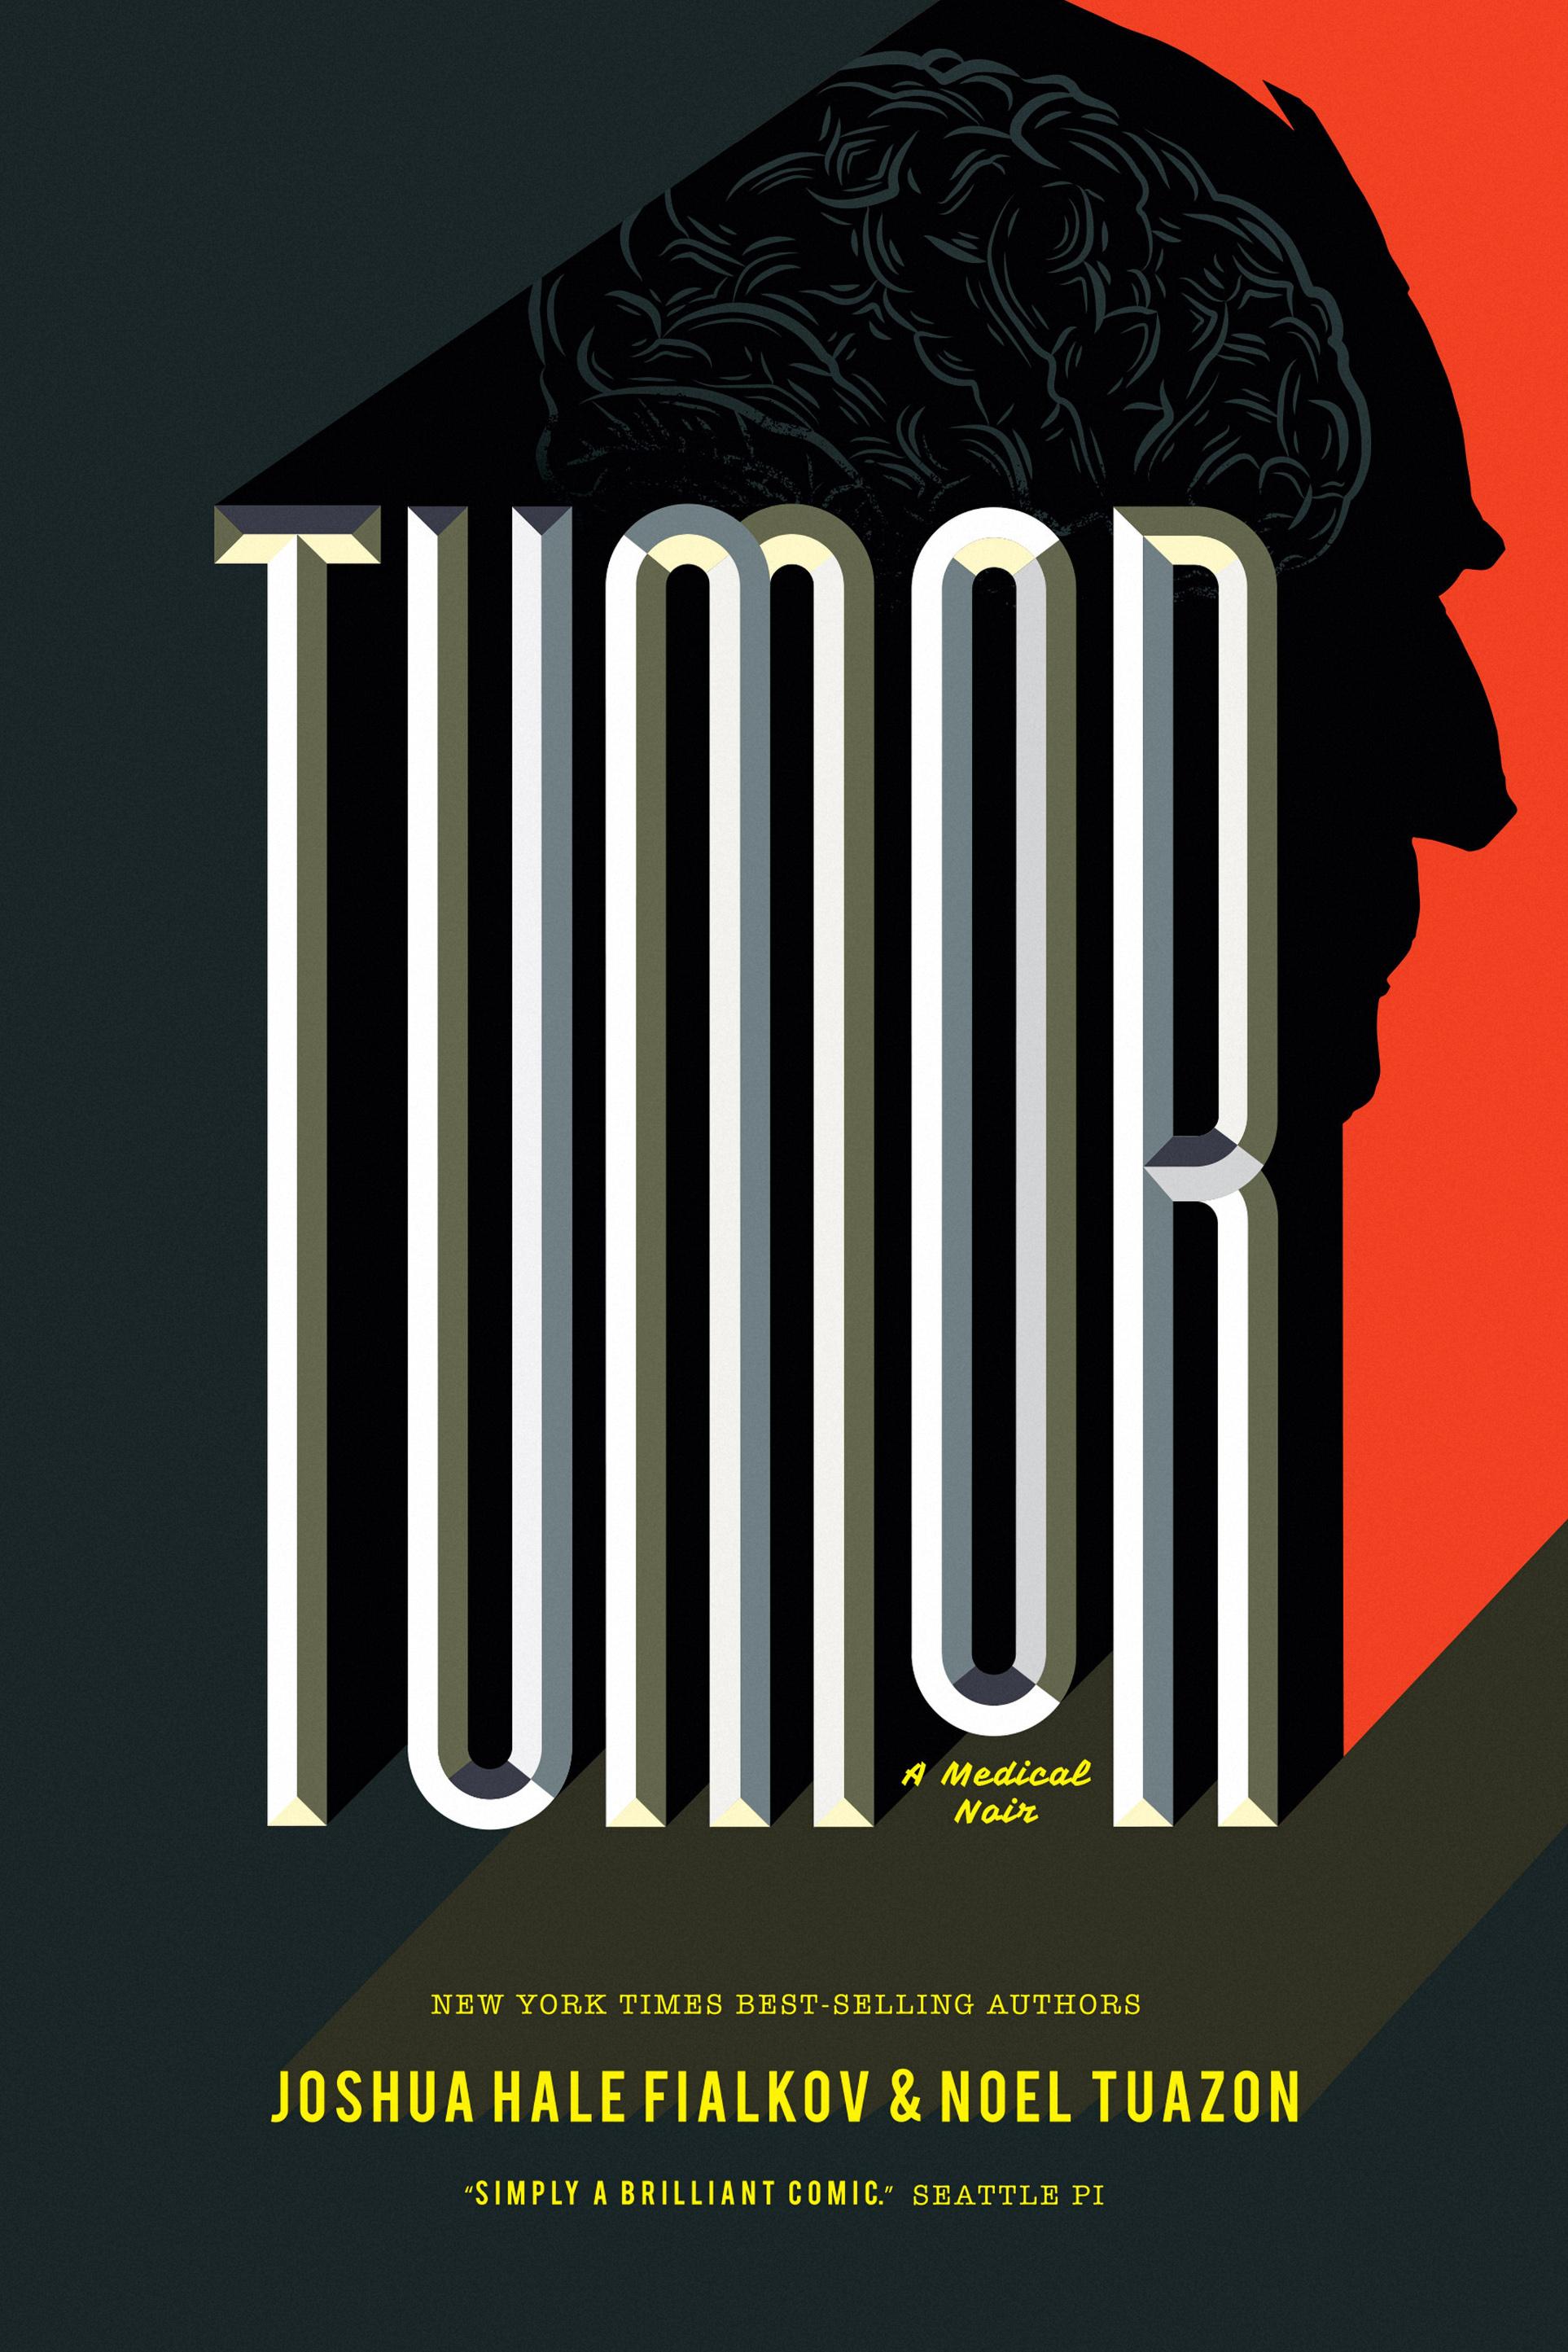 Read online Tumor comic -  Issue # TPB - 1